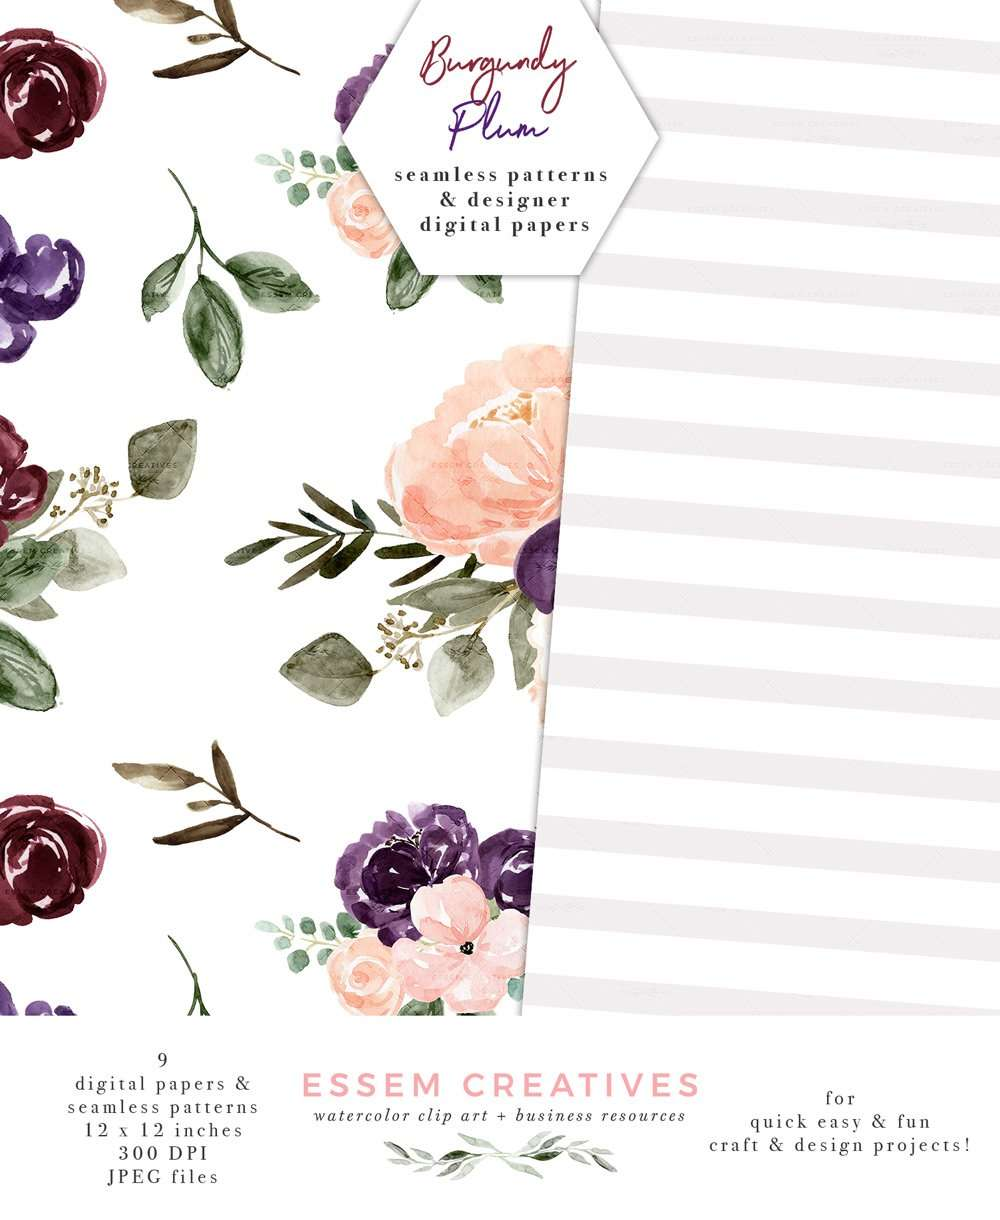 Floral Digital Paper Burgundy Blush Watercolor Fall Scrapbooking Paper Seamless Repeat Patterns Essem Creatives Watercolor Clipart Business Branding